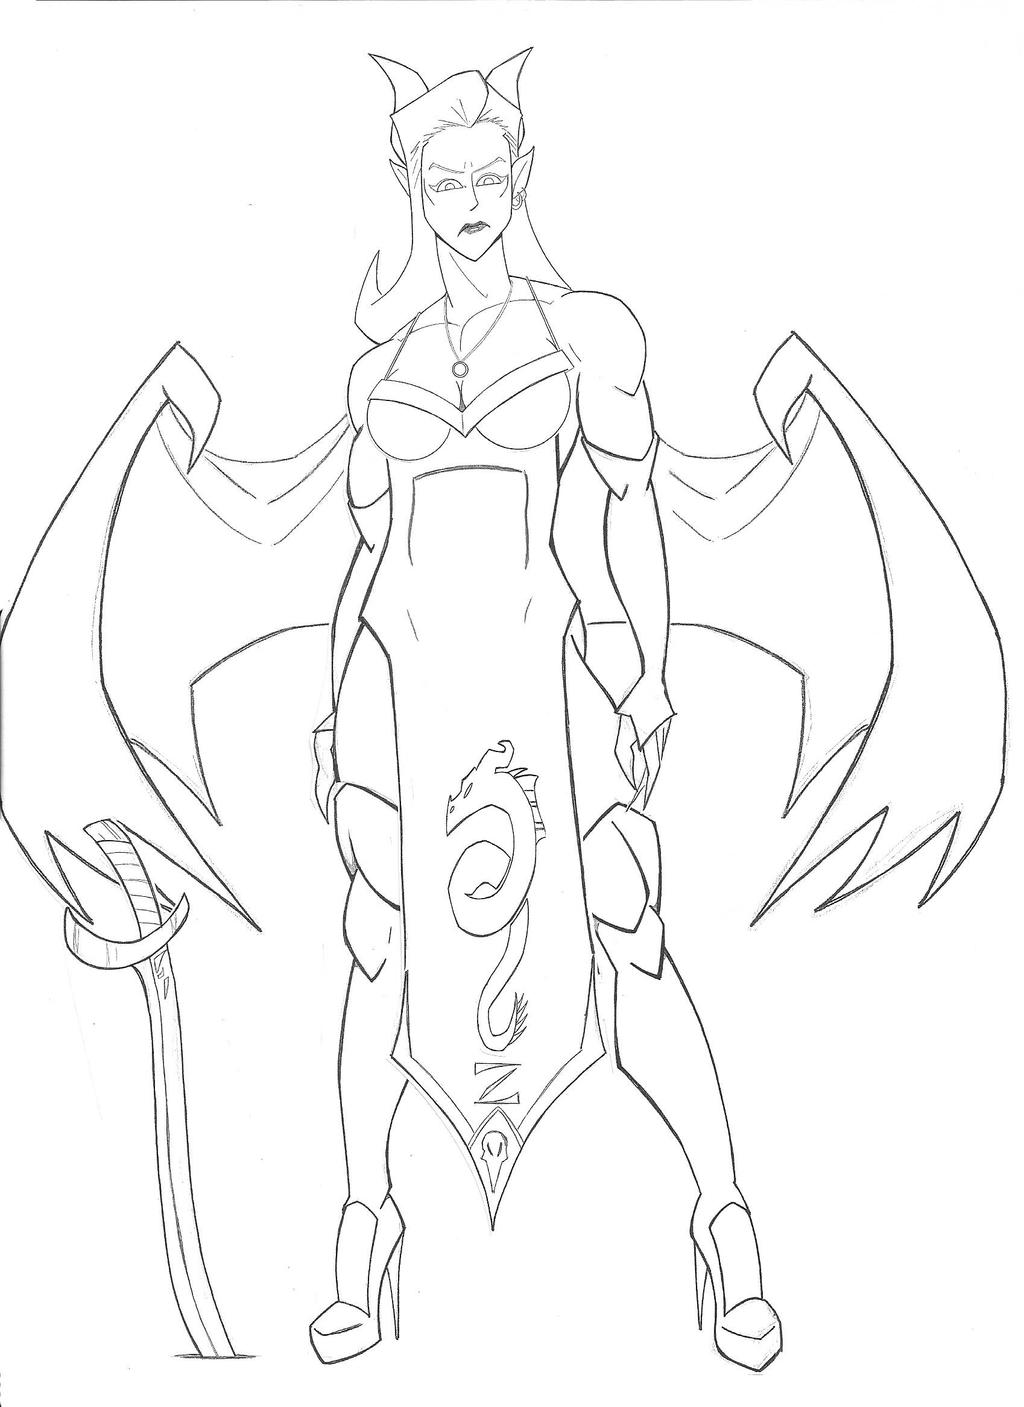 The Dragon's Dress